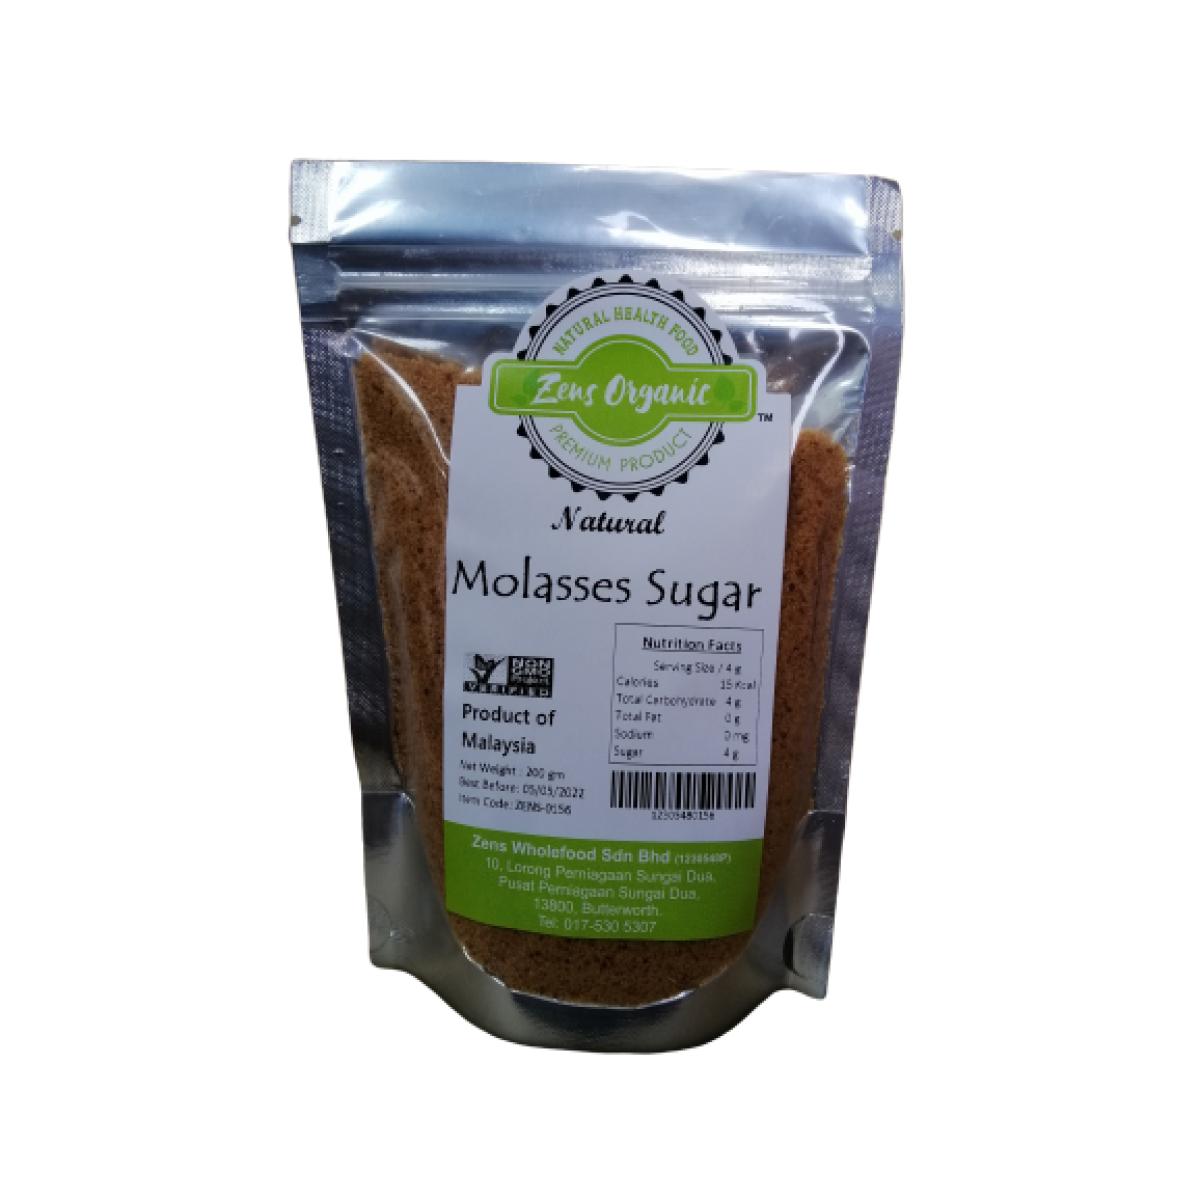 Zens Organic Natural Molasses Sugar 200g